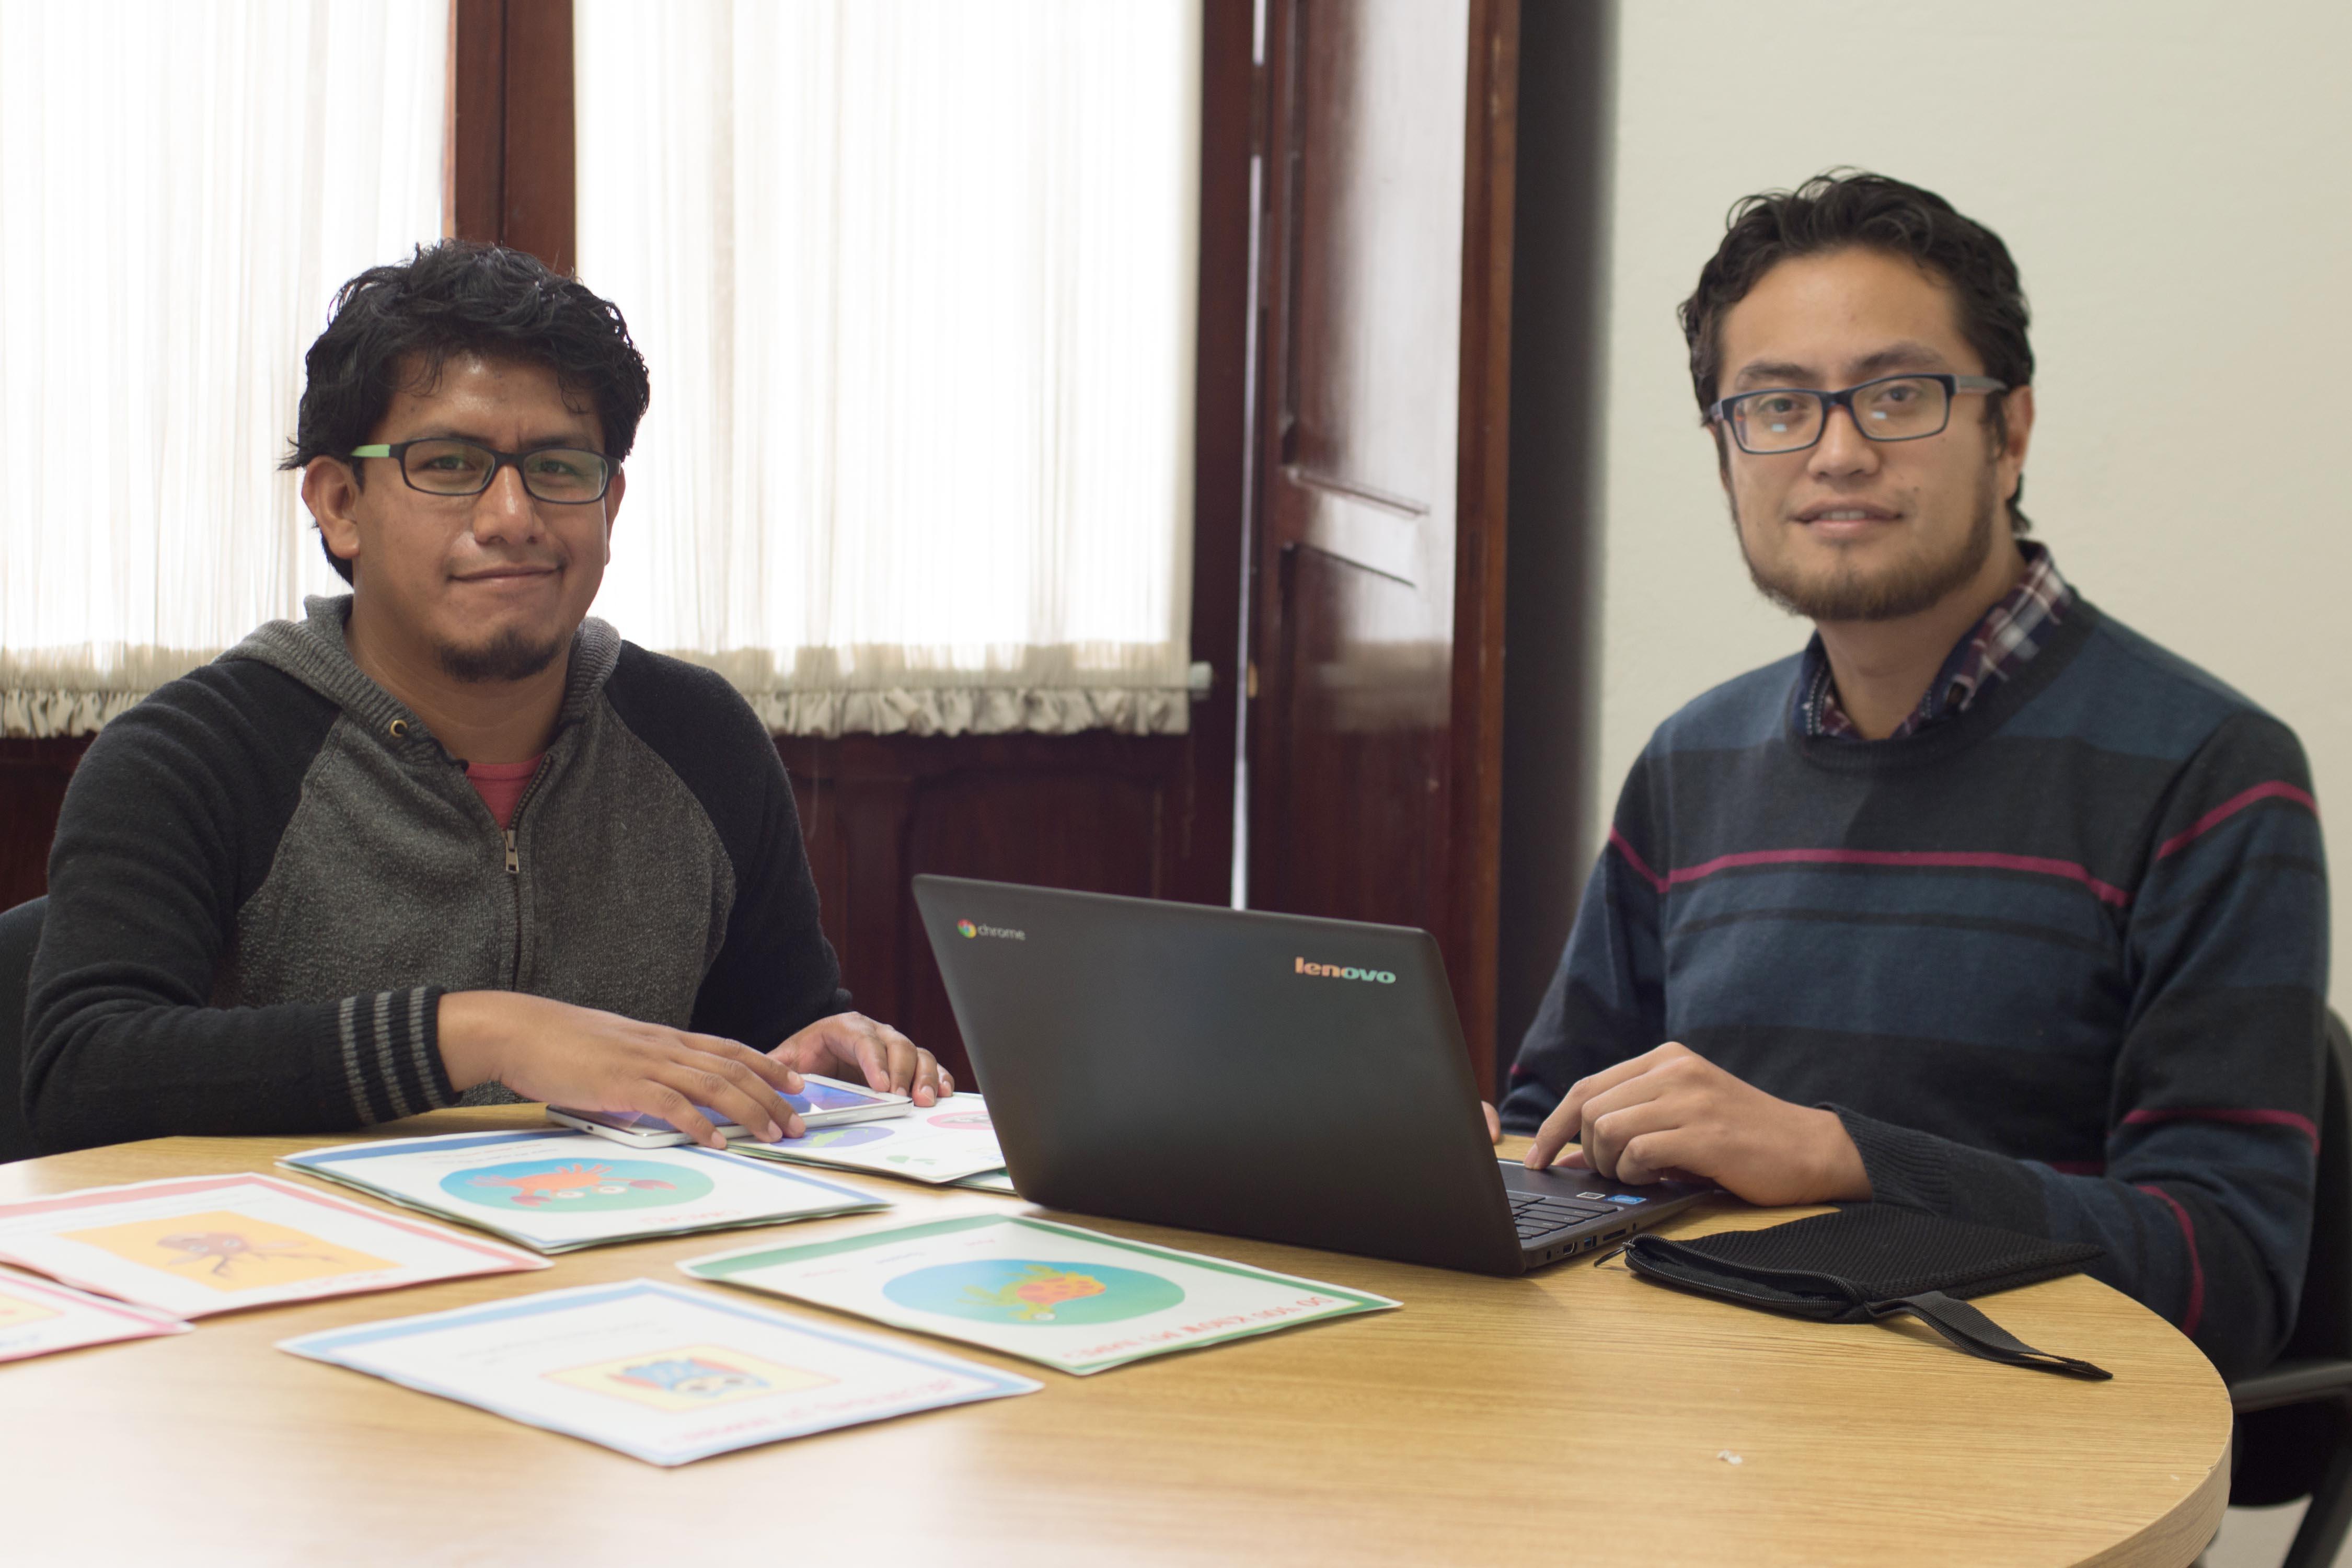 Desarrollan plataforma interactiva para enseñar español, náhuatl e inglés